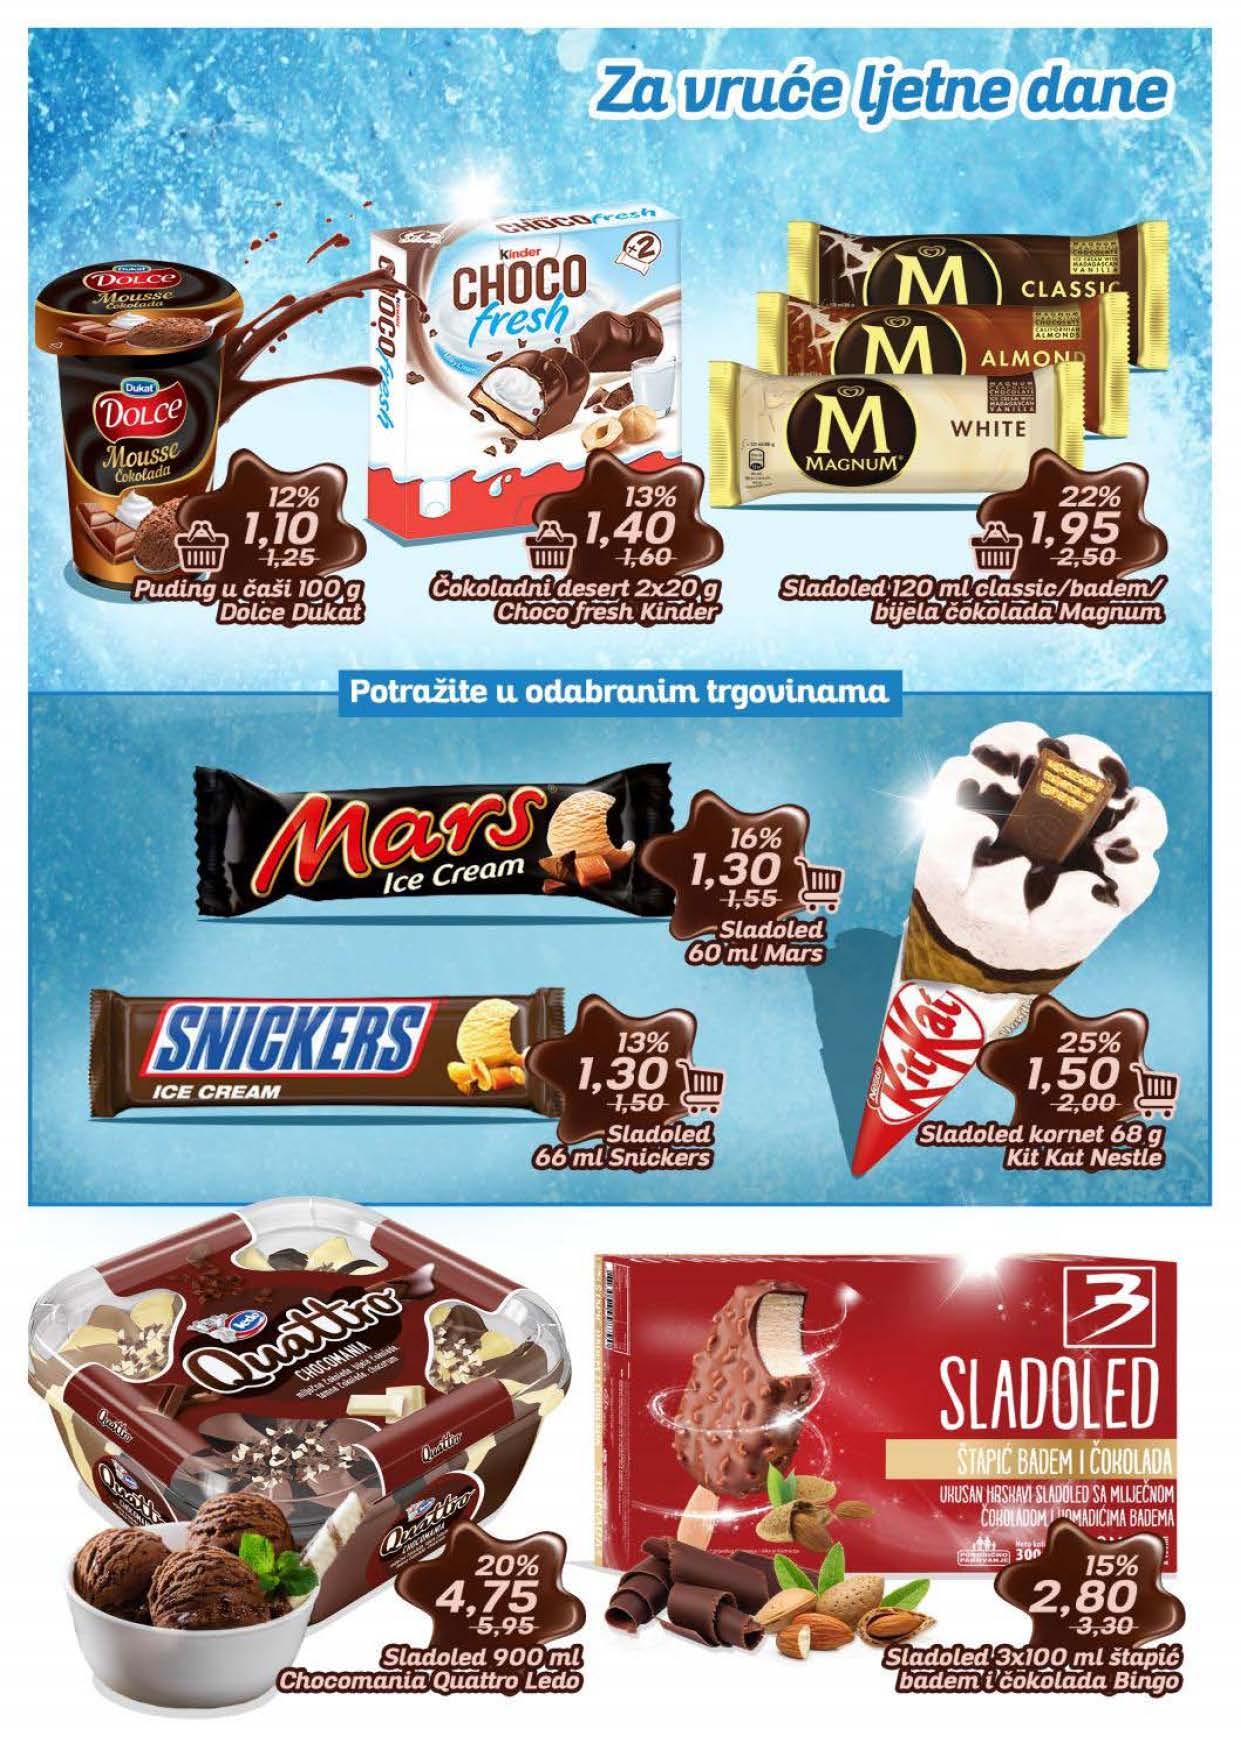 BINGO Katalog Dani cokolade JUL 2021 1.7.2021. 7.7.2021. Page 5